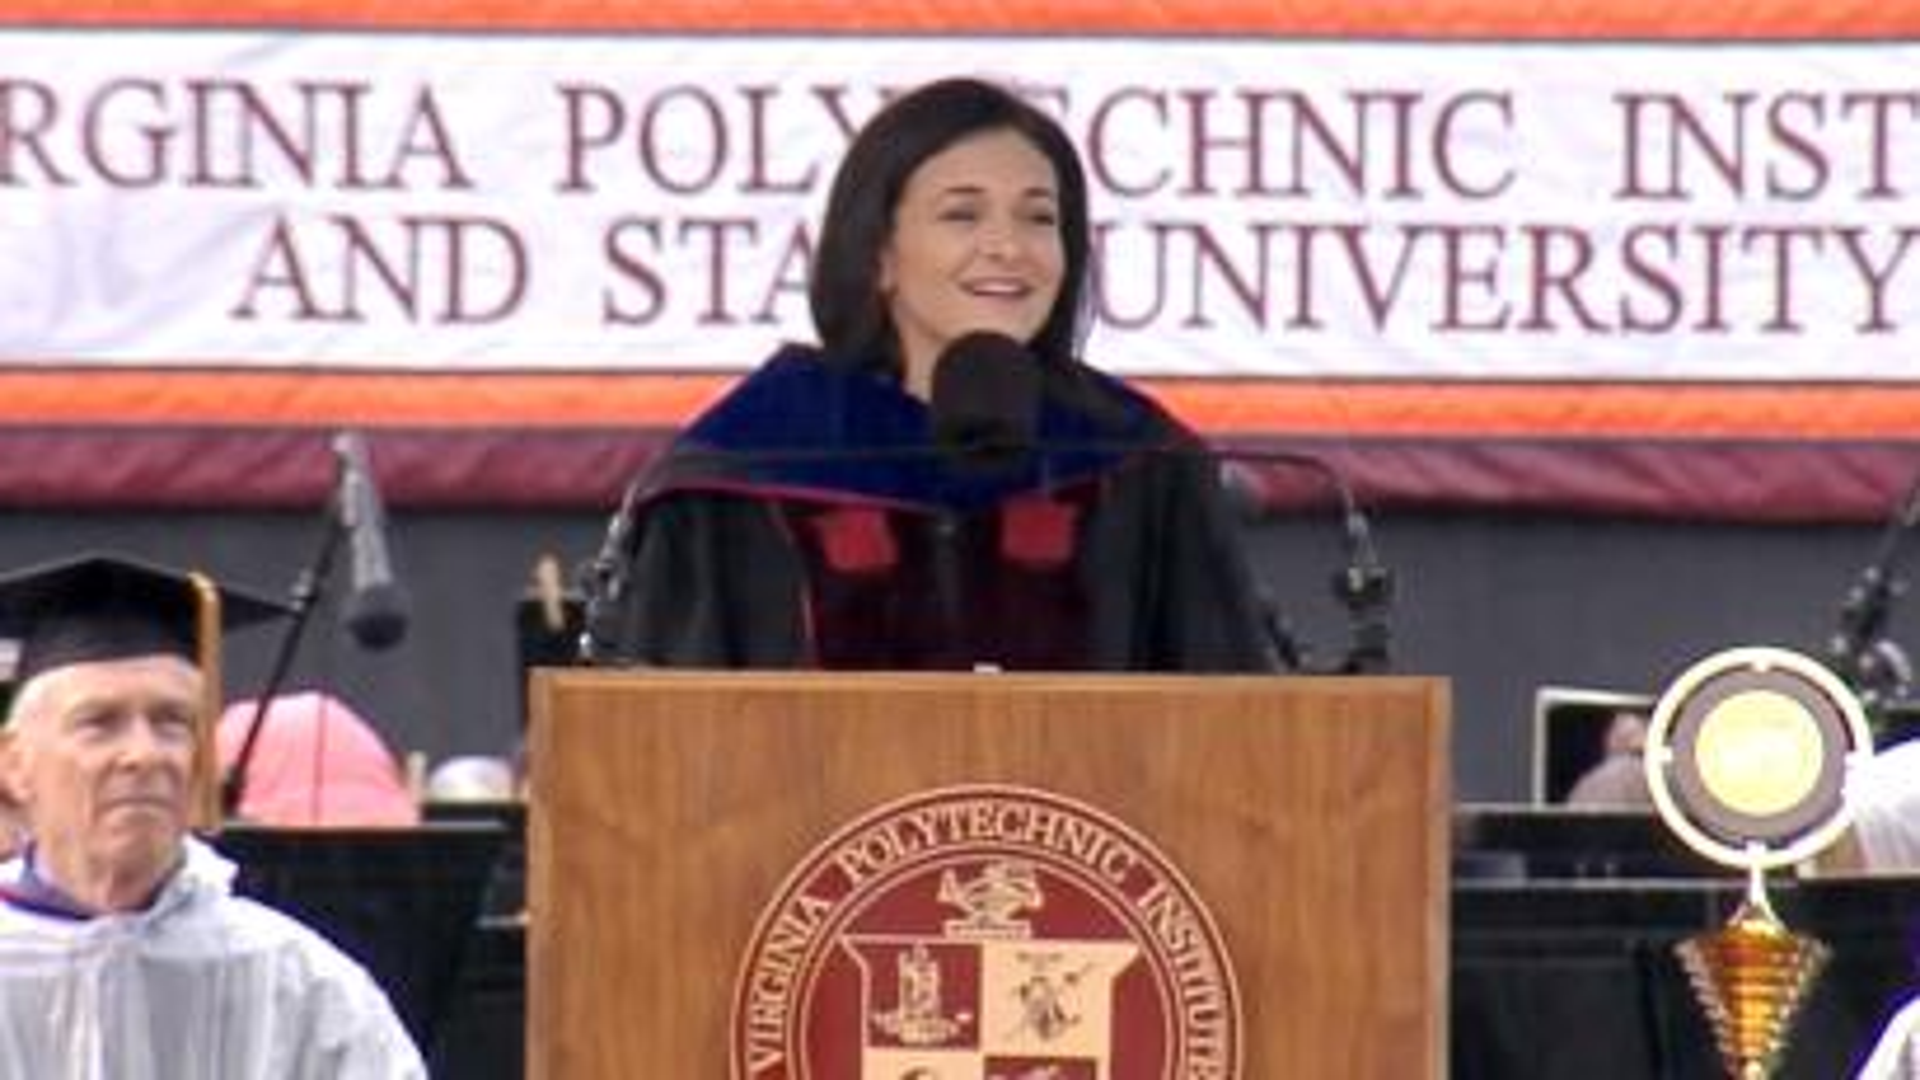 Facebook COO Sheryl Sandberg gives the commencement speech at Virginia Tech.